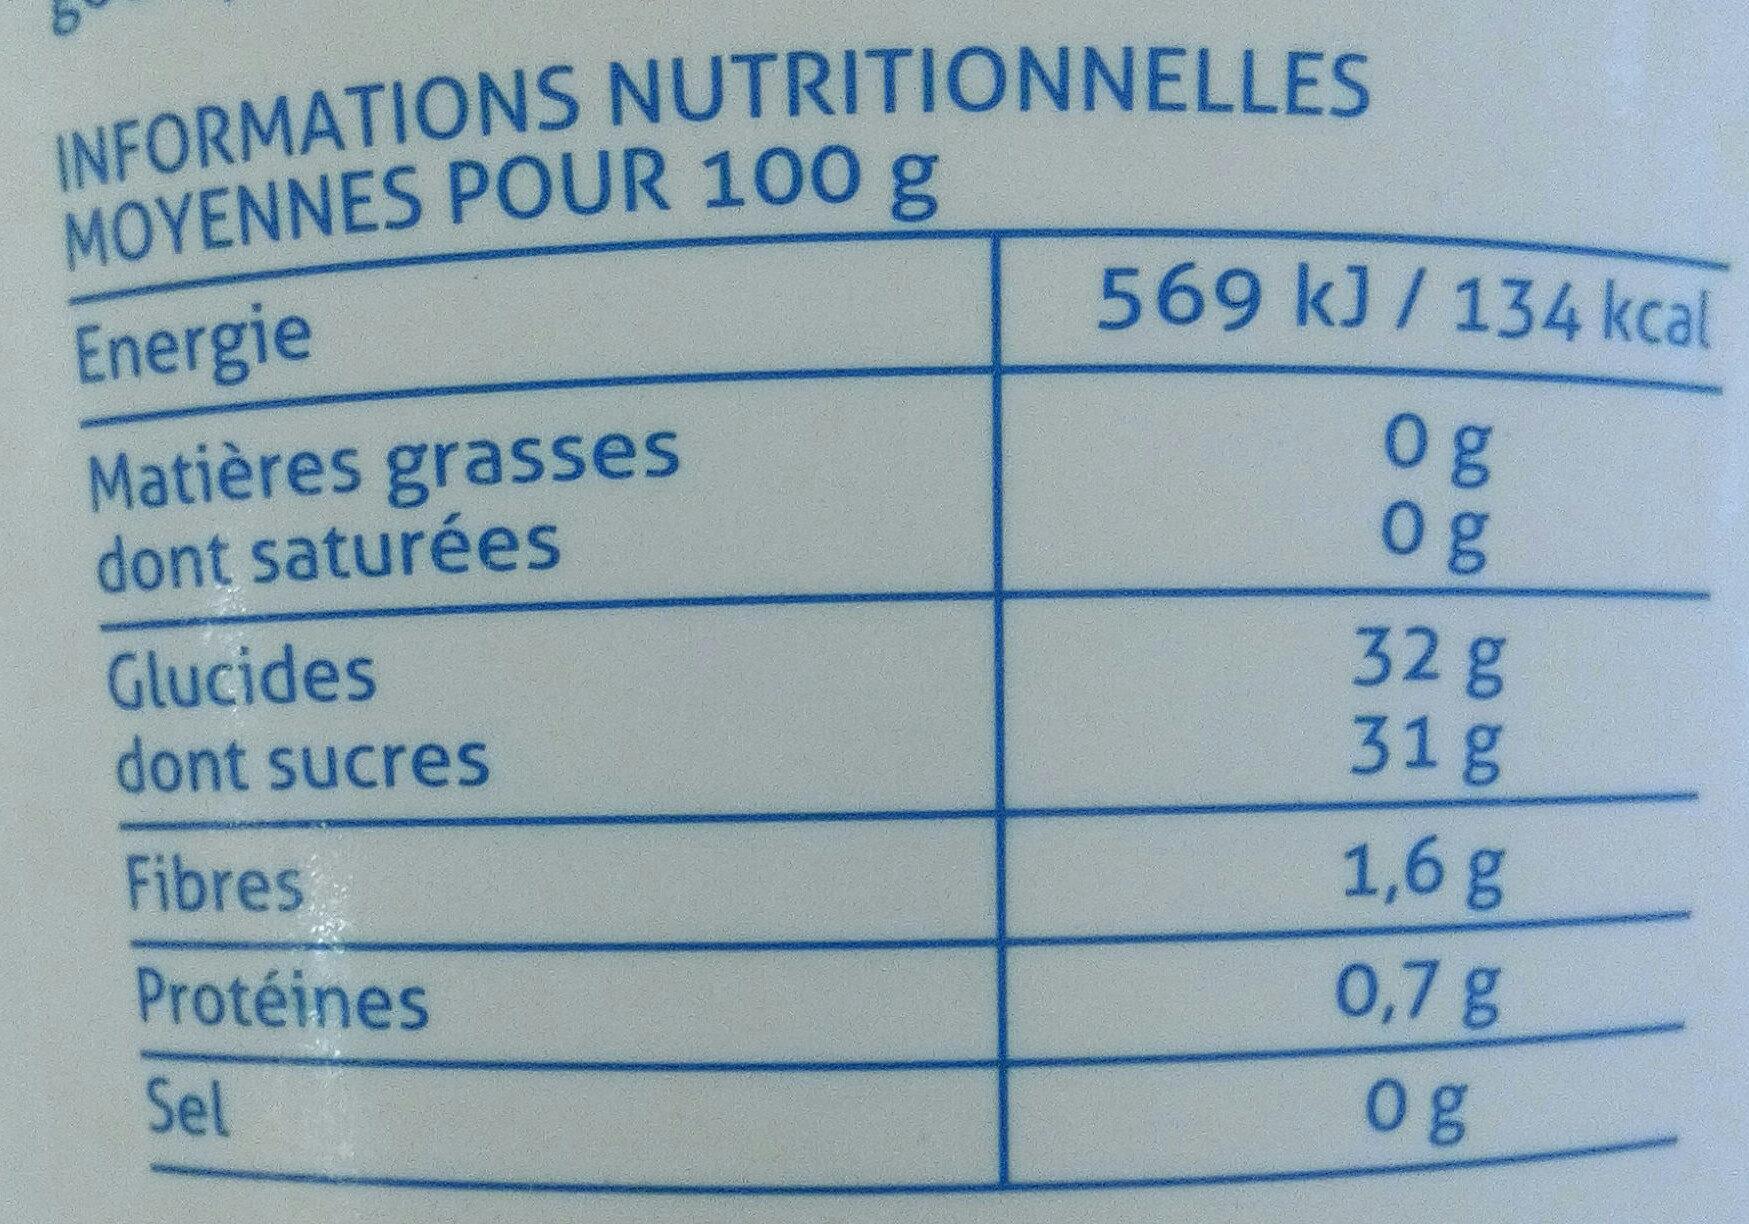 Framboise plein fruit - Informations nutritionnelles